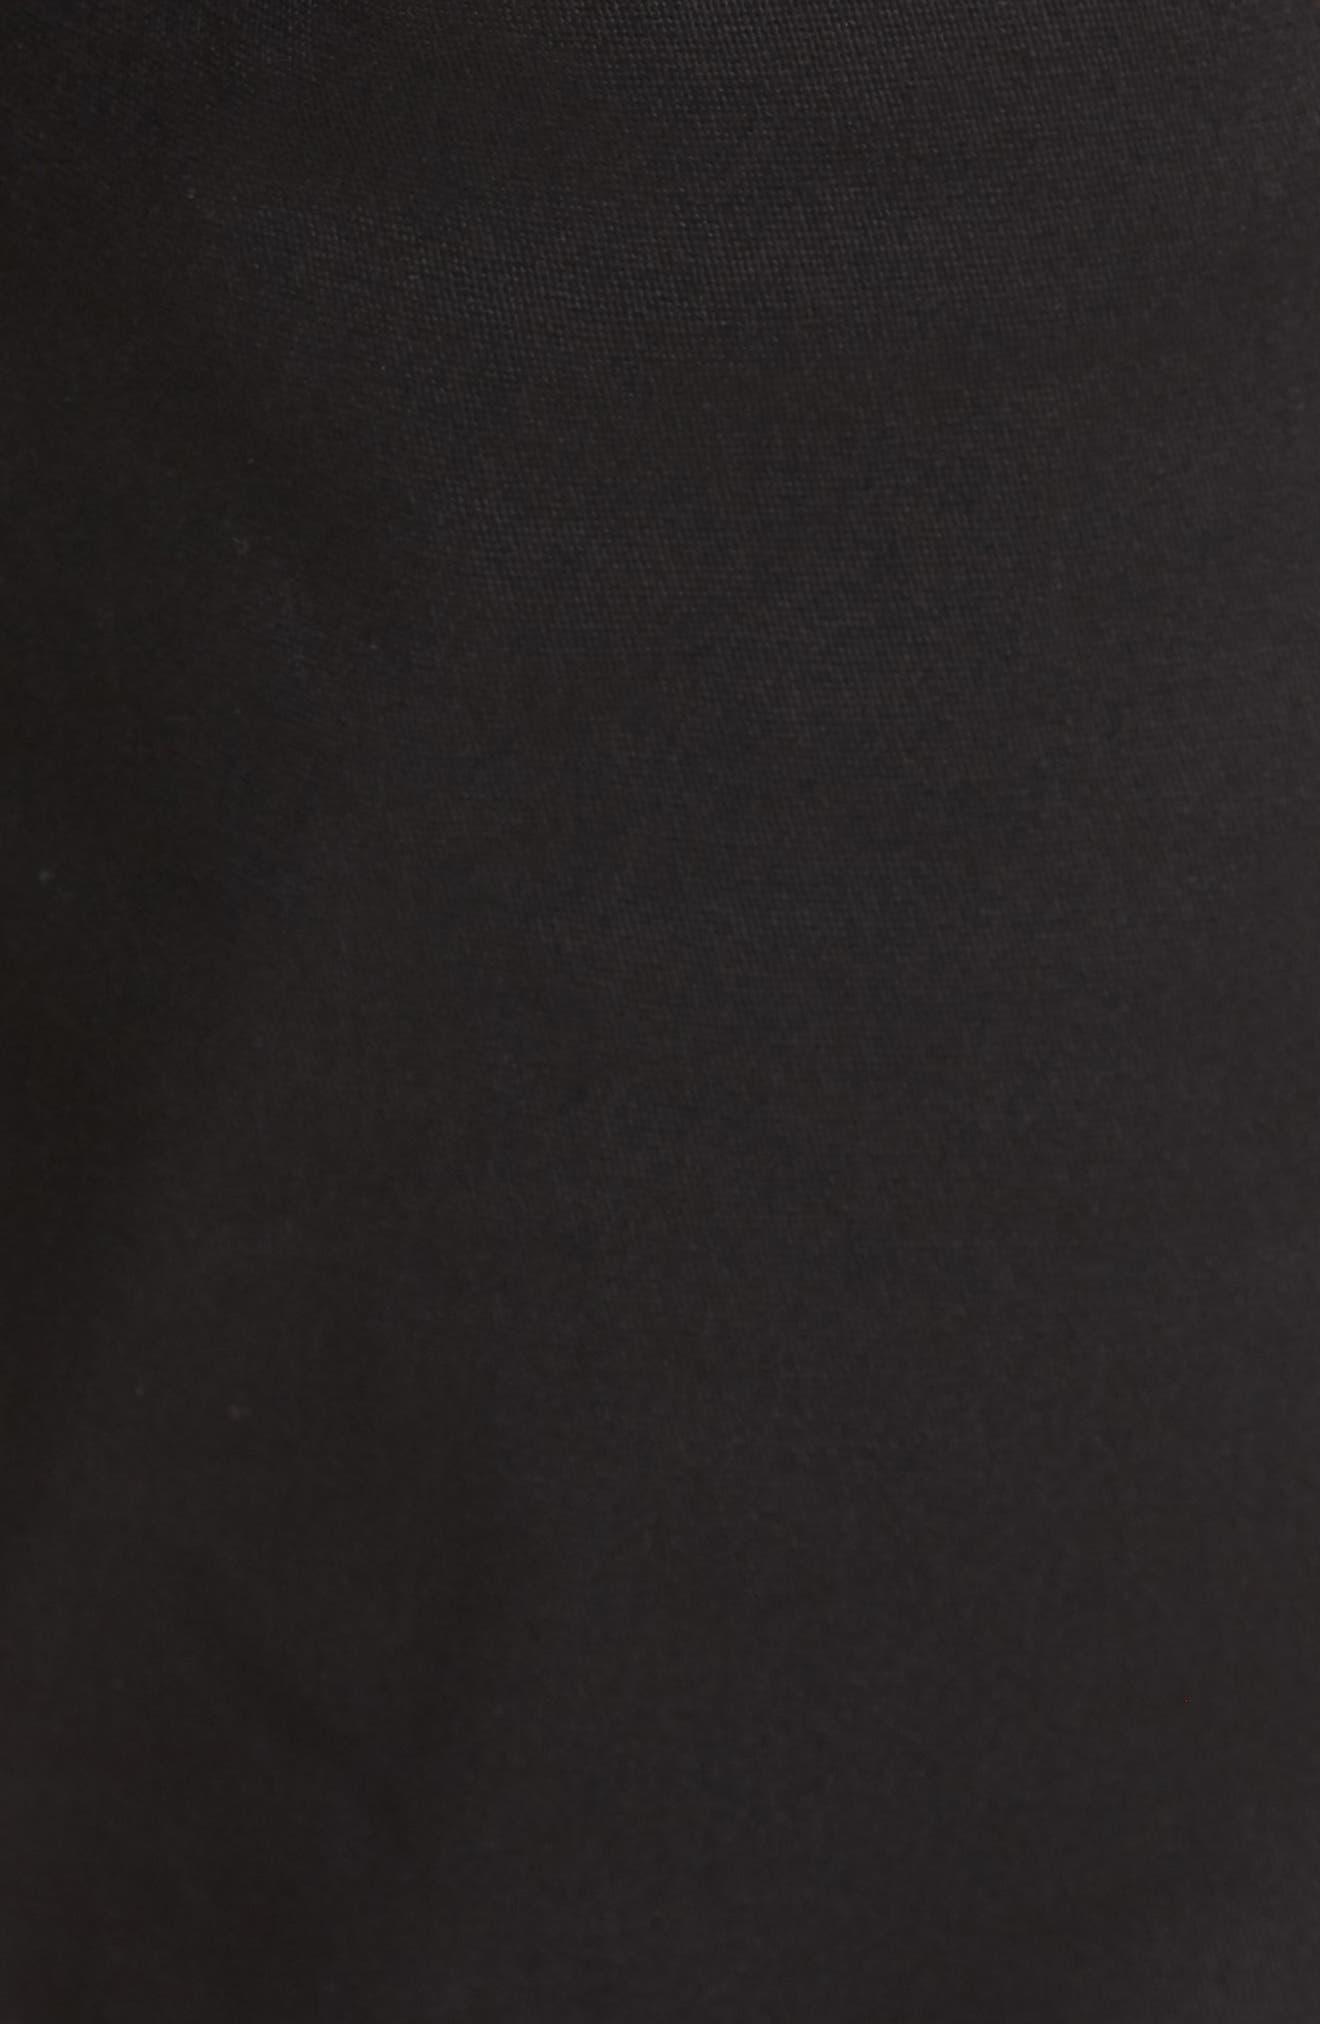 Runner Slim Fit Jogger Pants,                             Alternate thumbnail 5, color,                             Black